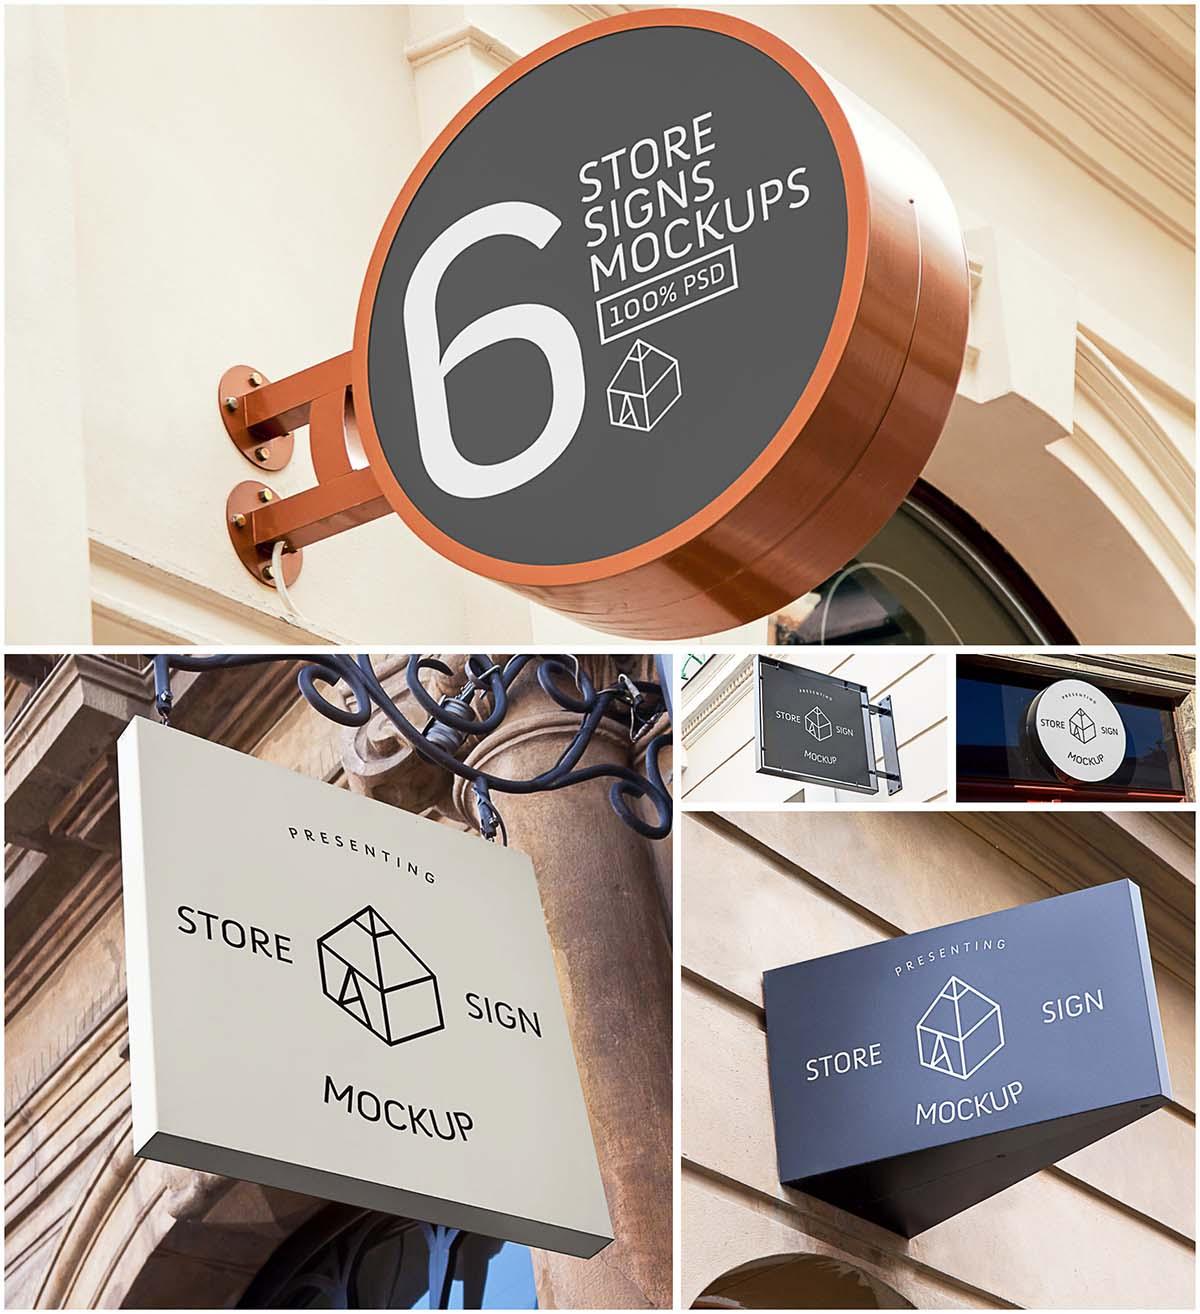 6 store signs mockup